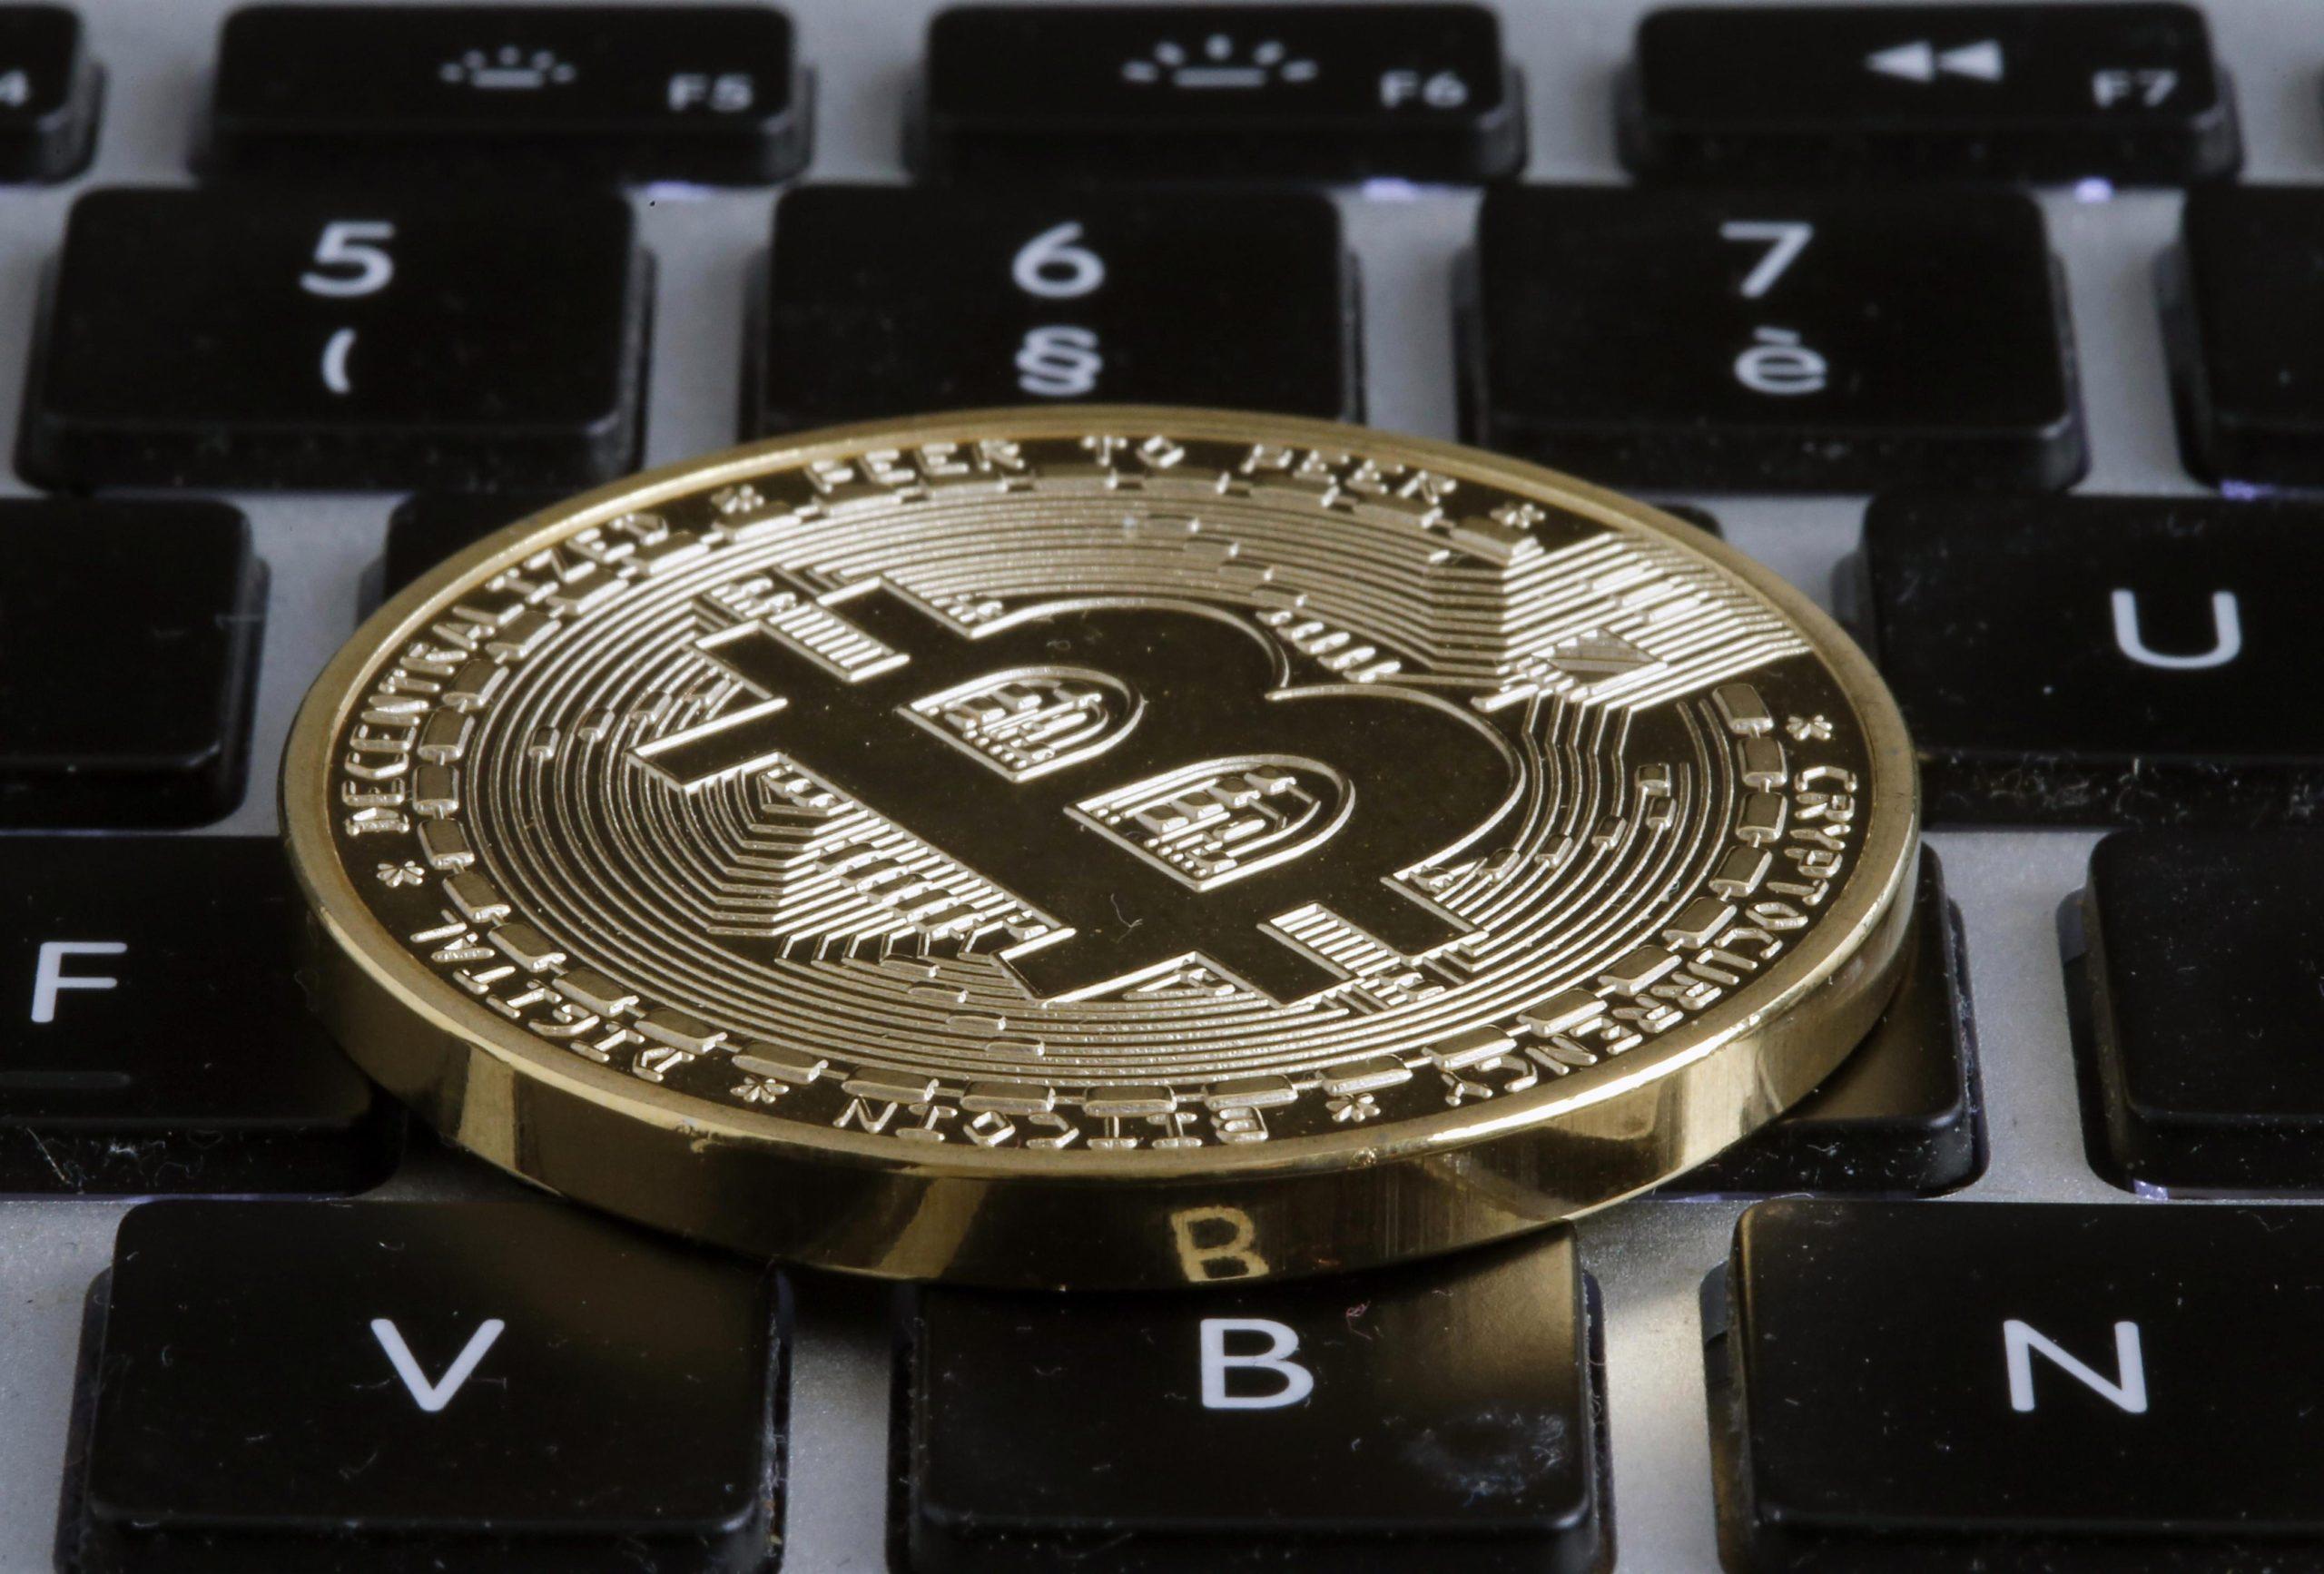 Bitcoin Barzahlung Erfahrung Unübertroffen, Während Bitcoin Core In Australien Implodiert